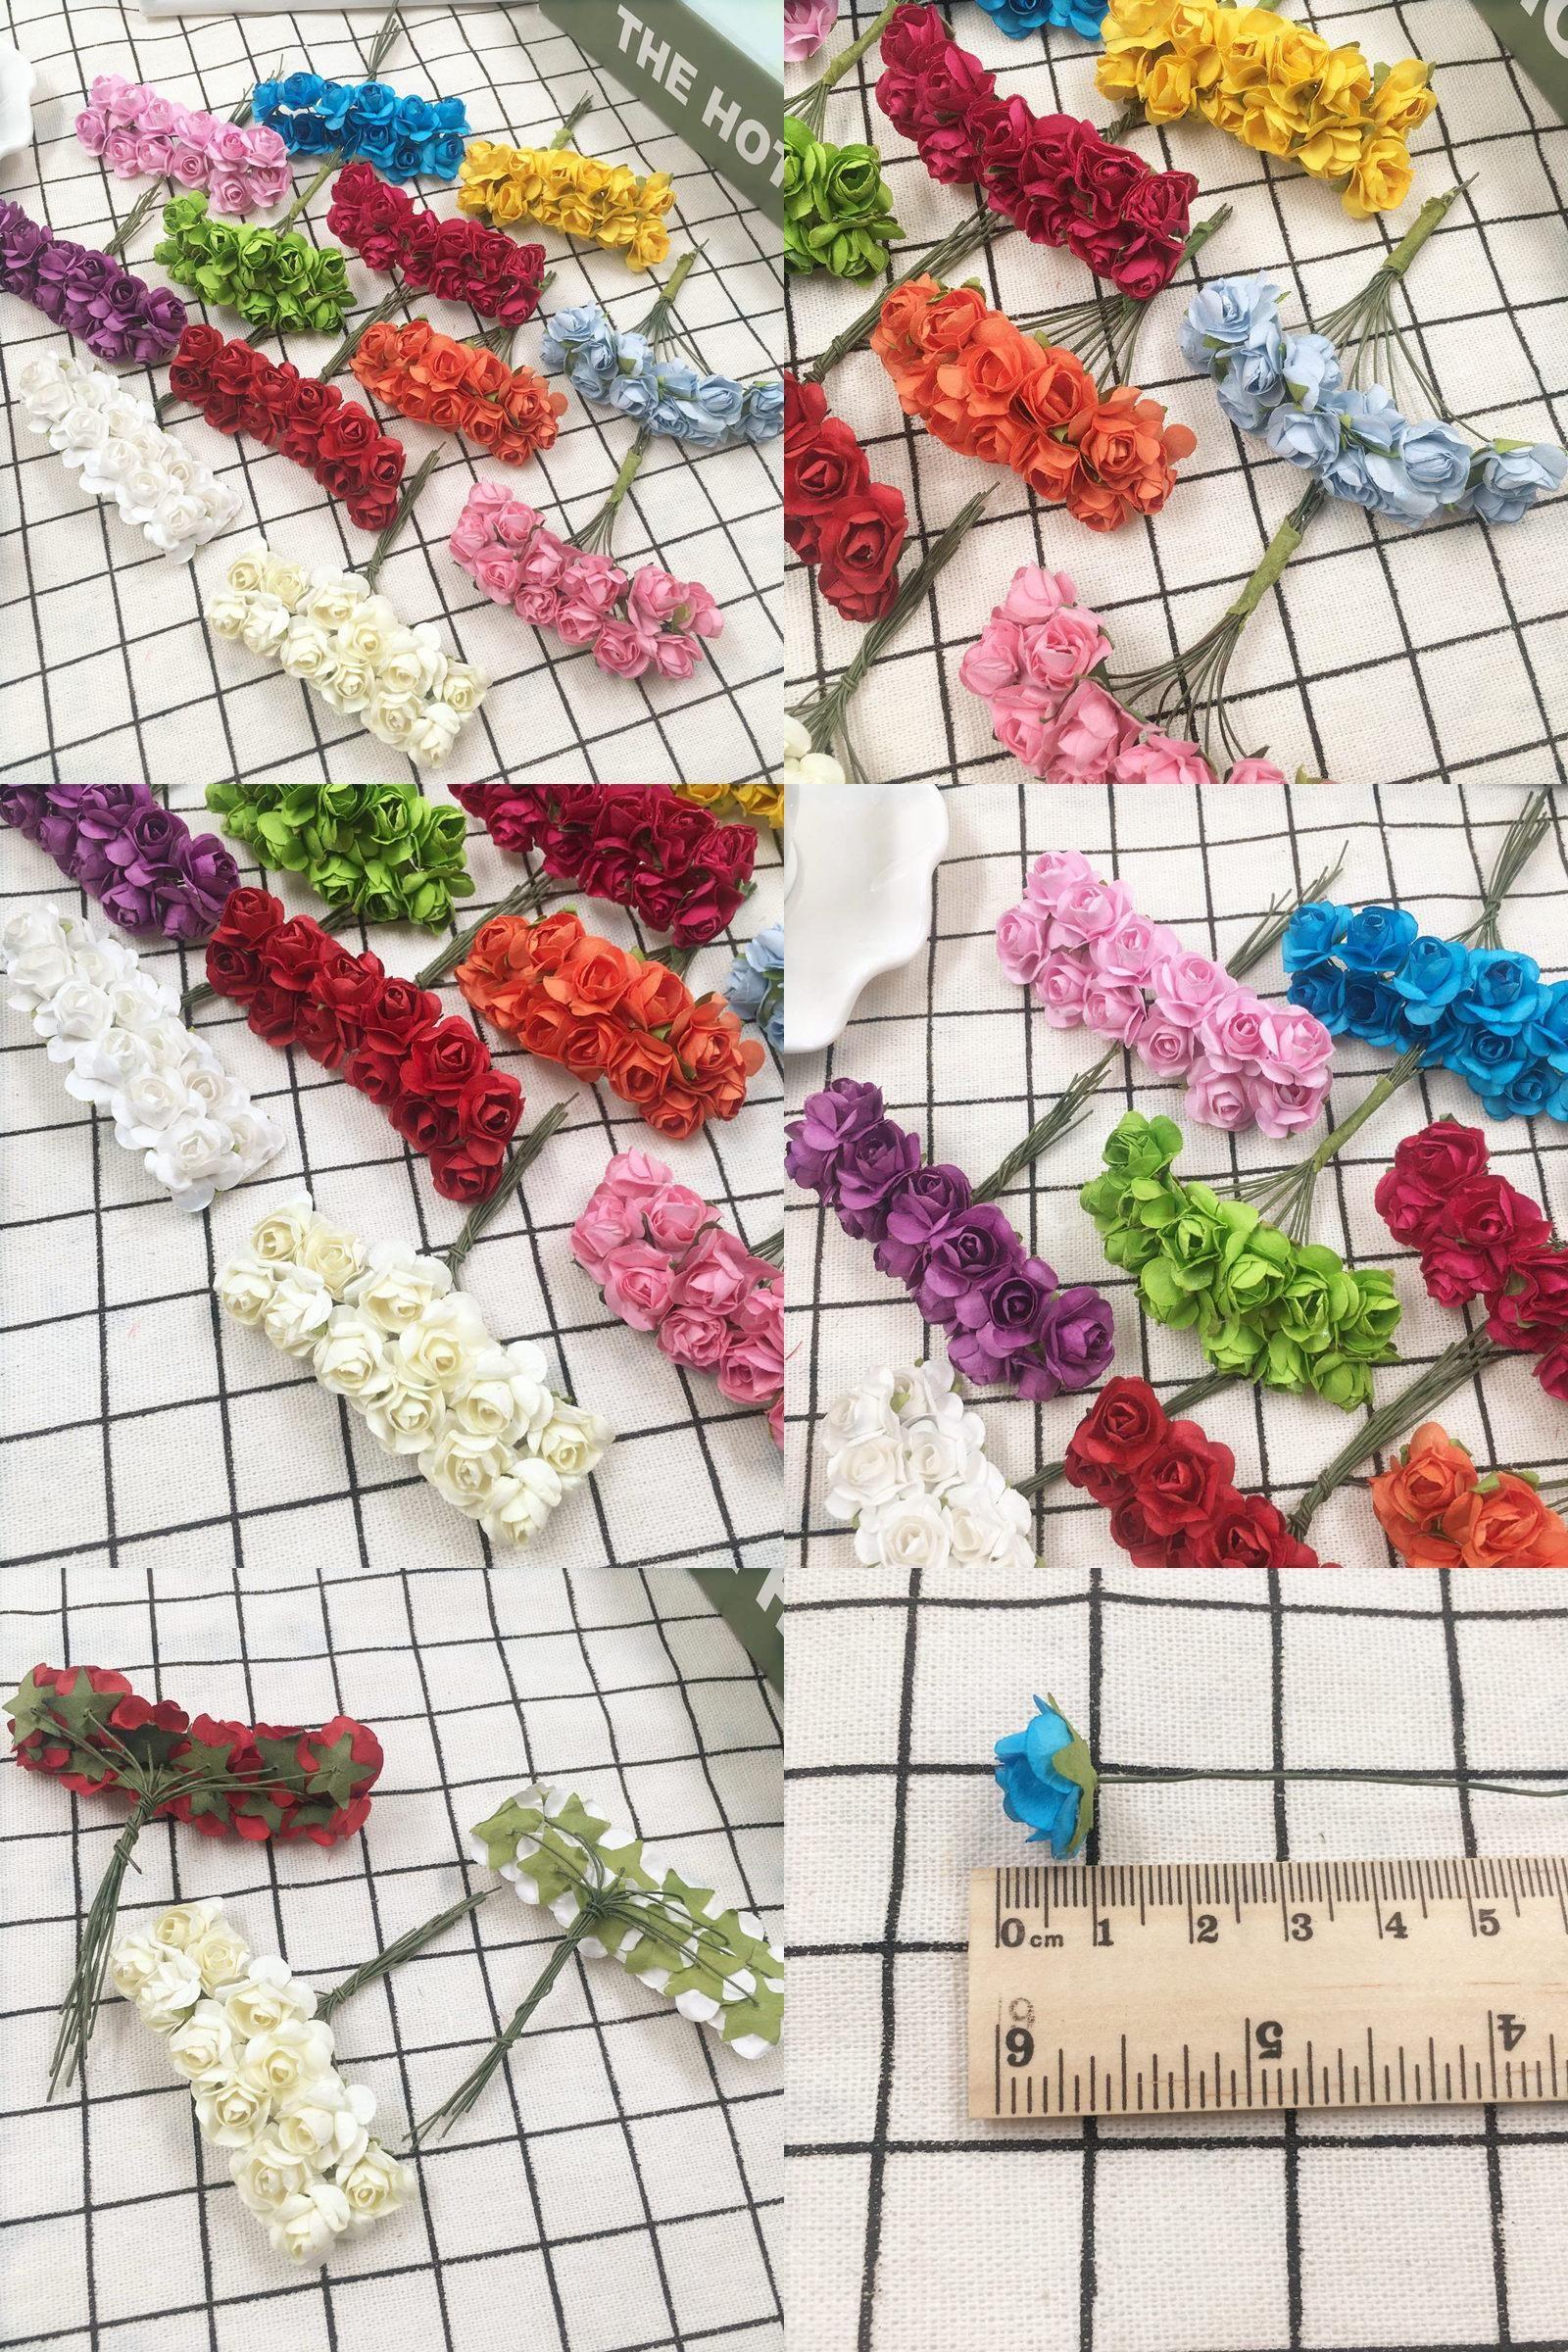 Visit To Buy 24 Pcs 1 Cm Artificial Bouquets Of Roses Paper